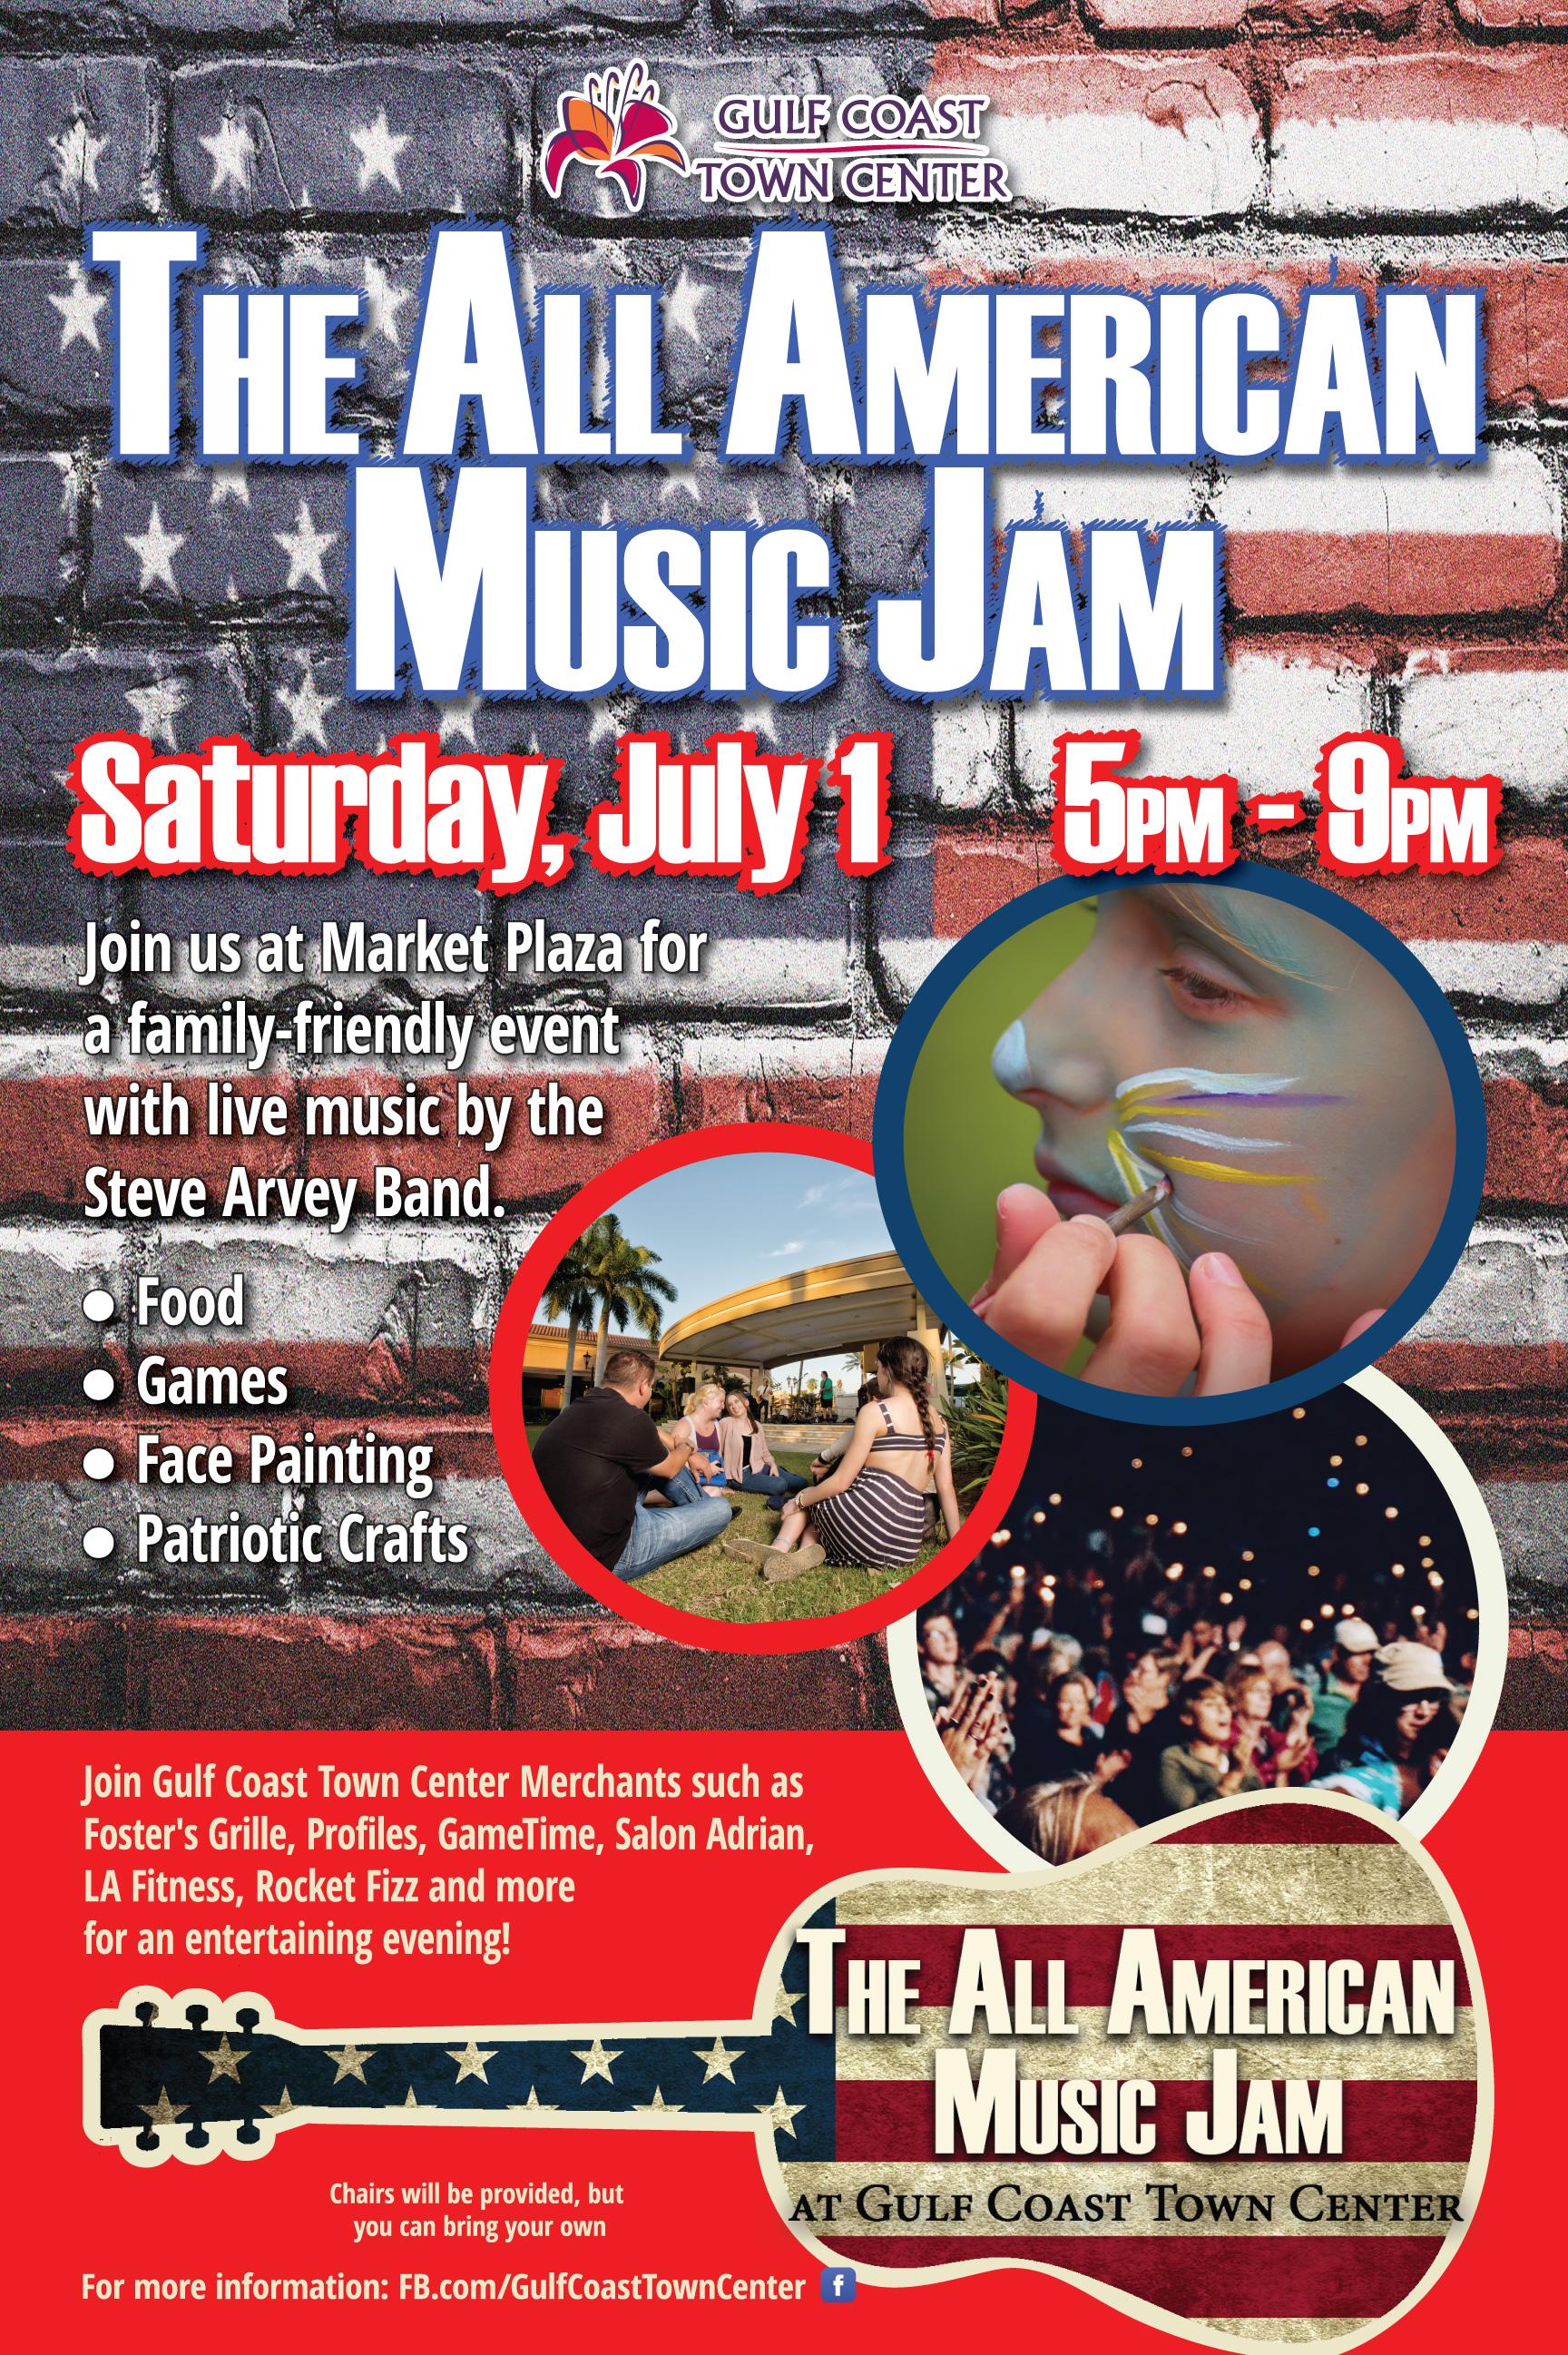 Gulf Coast Town Center Music Festiva